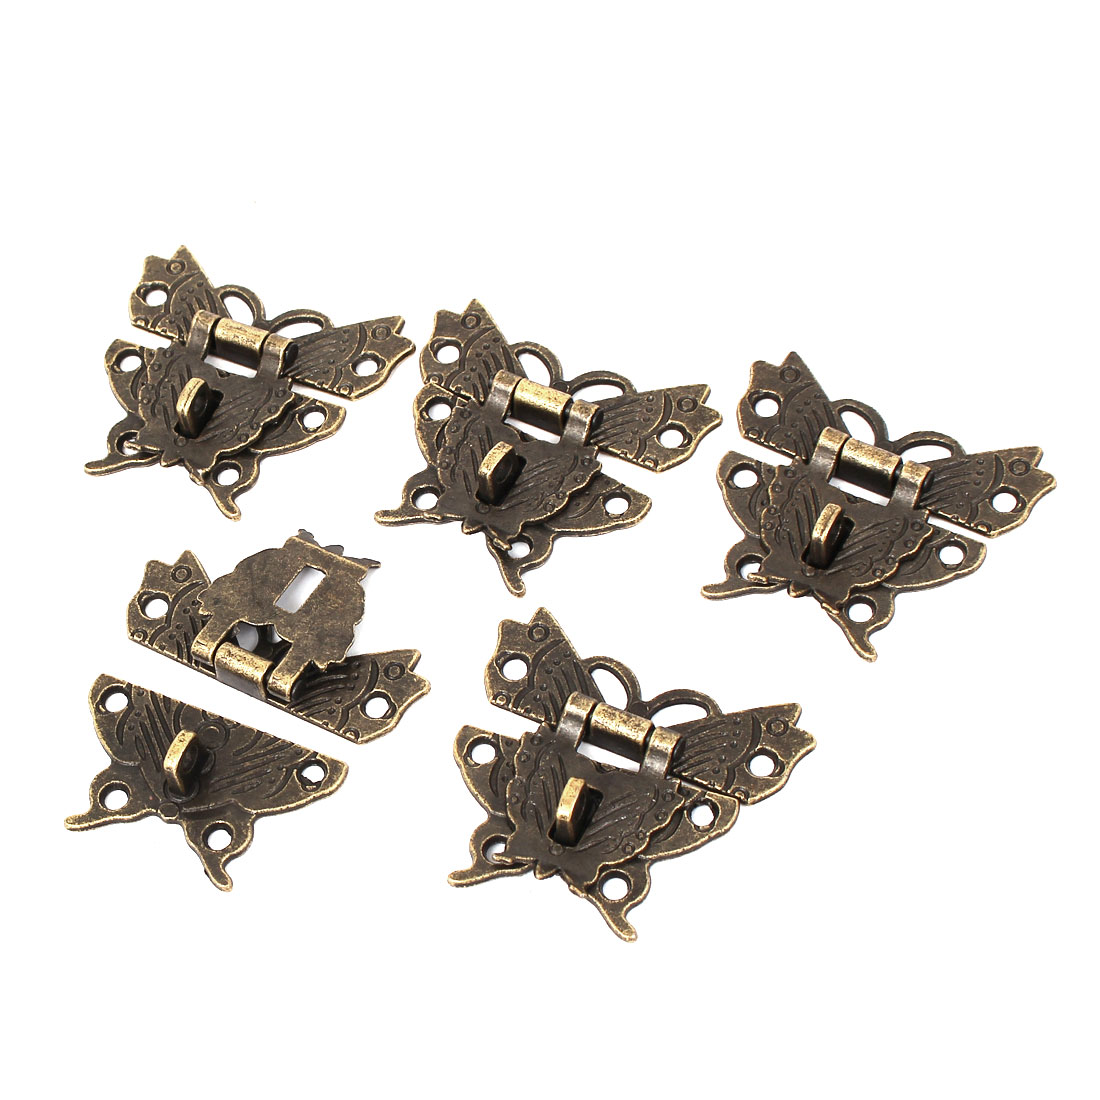 Wooden Case Box Butterfly Shape Hasp Lock Latch Bronze Tone 5pcs